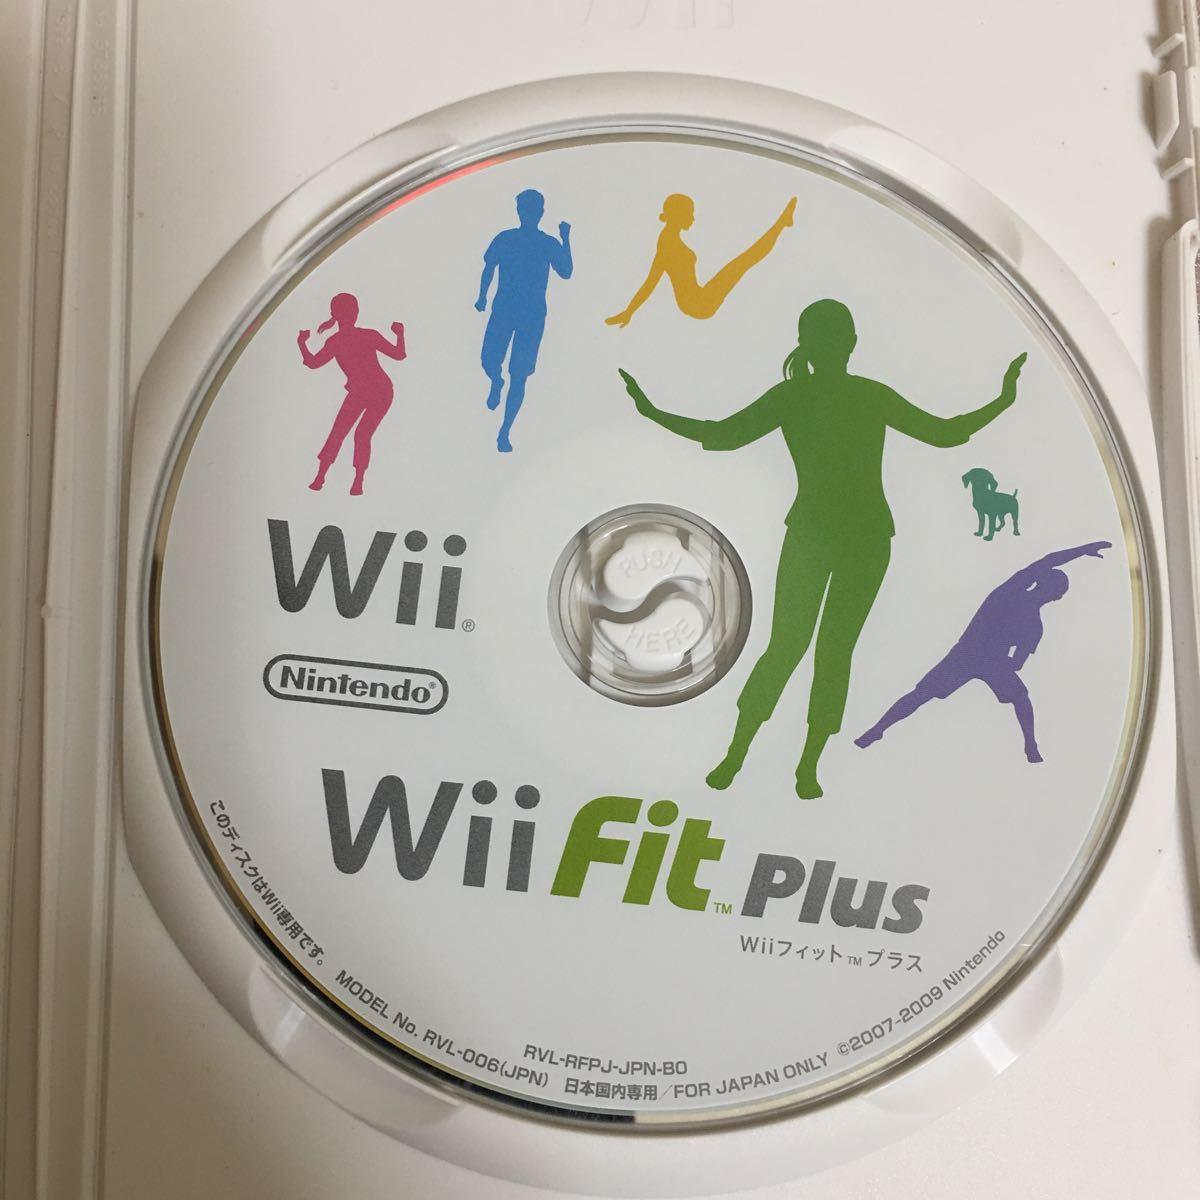 Wiiソフト Wiiフィットプラス Wii Fit Plus ウィーフィットプラス